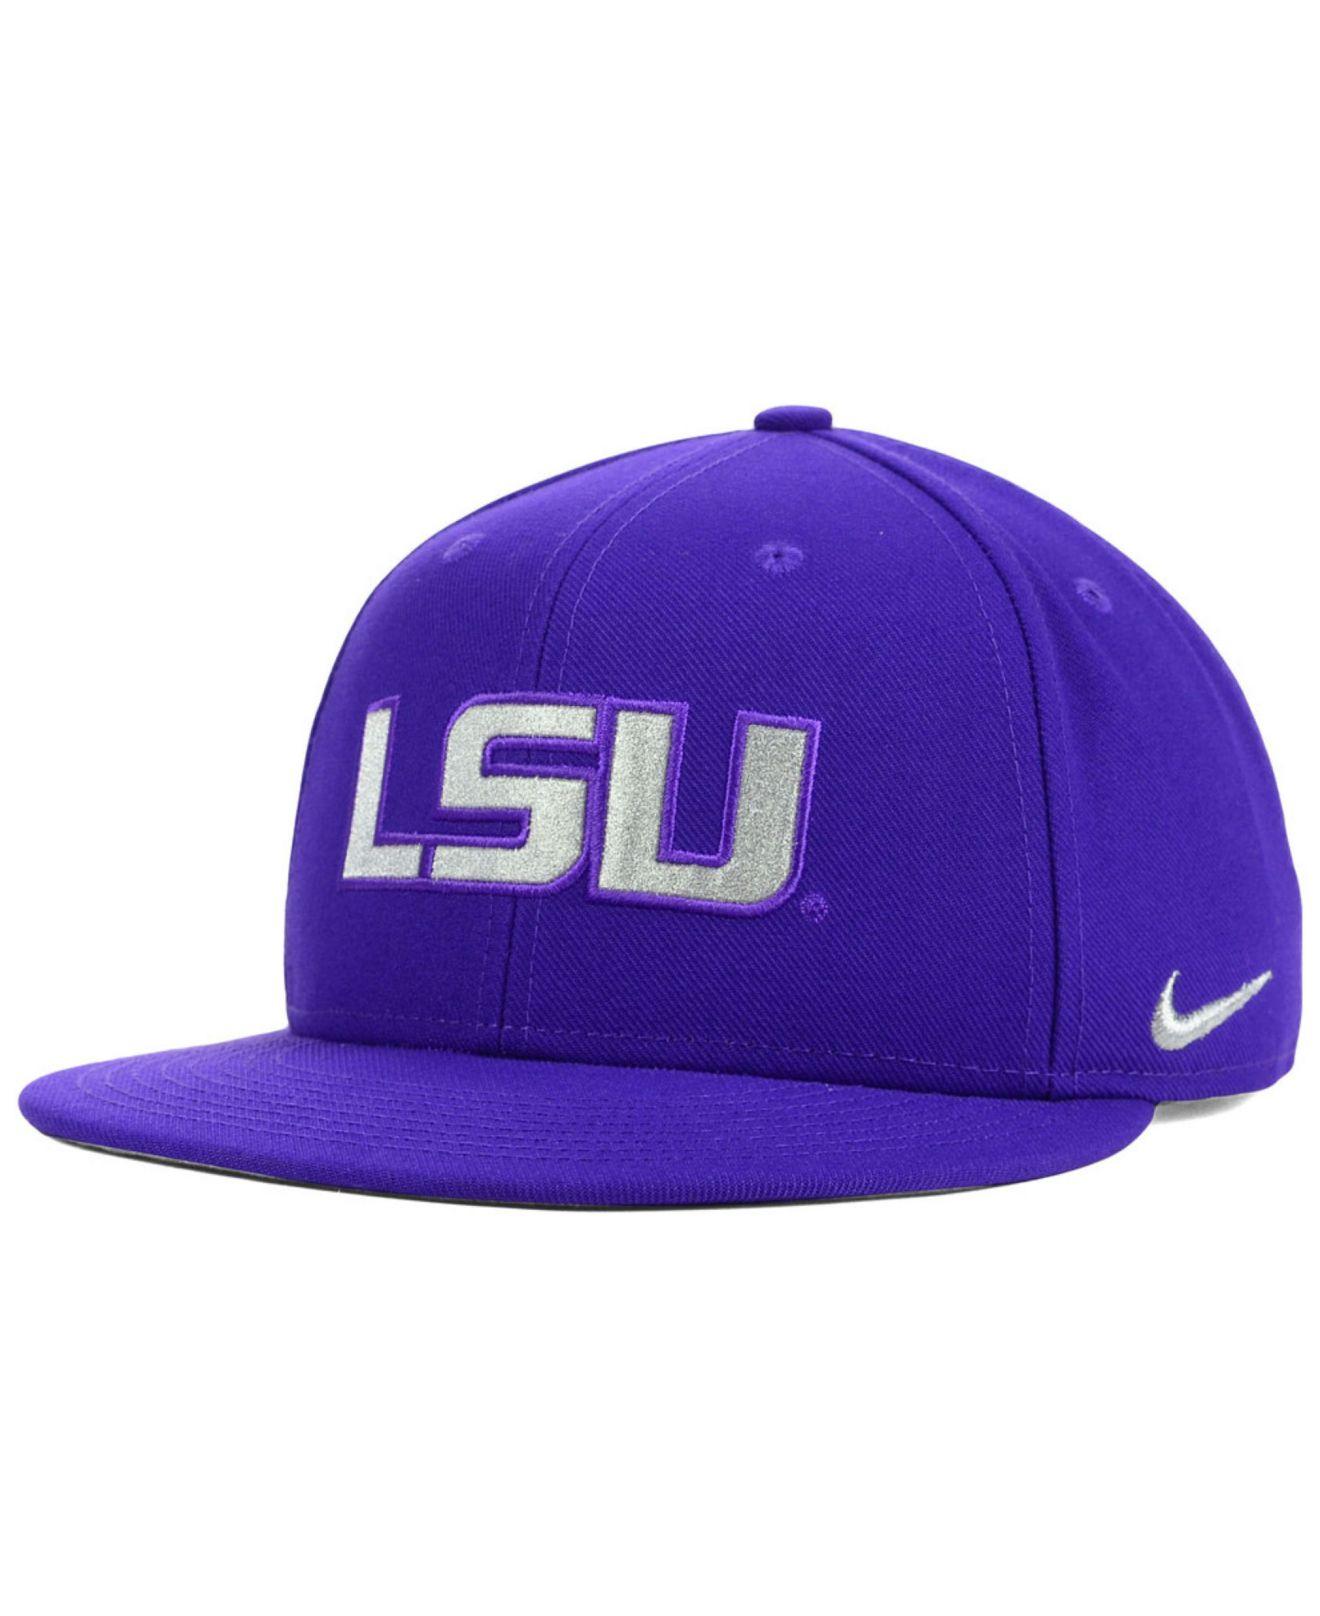 34090f926783c ... reduced lyst nike lsu tigers snapback cap in purple for men 98320 afb03